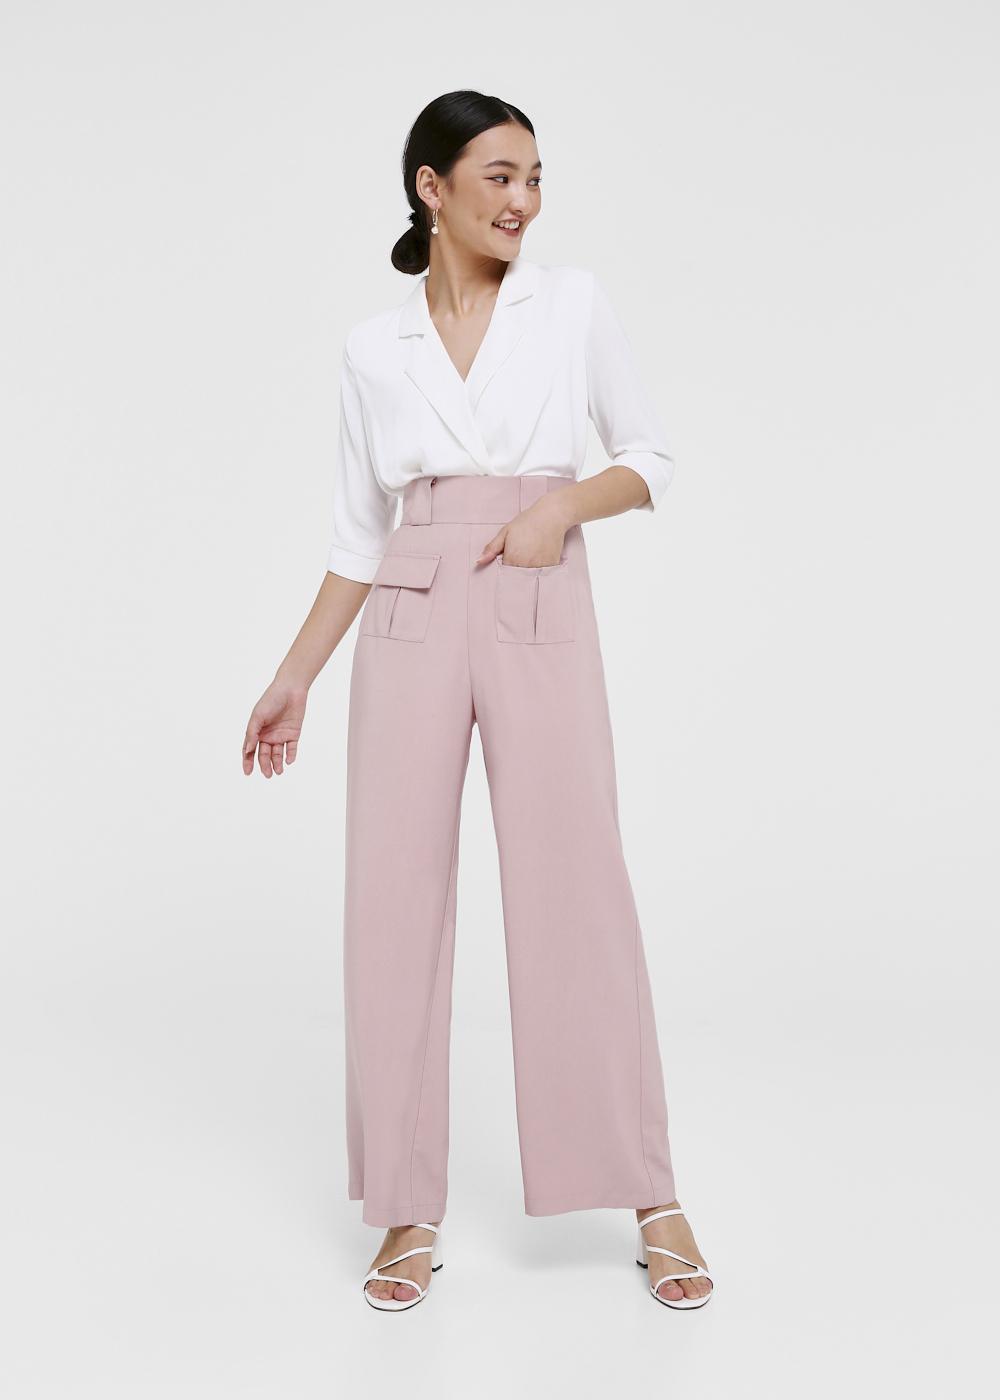 Roux Pocket Front High Waist Pants